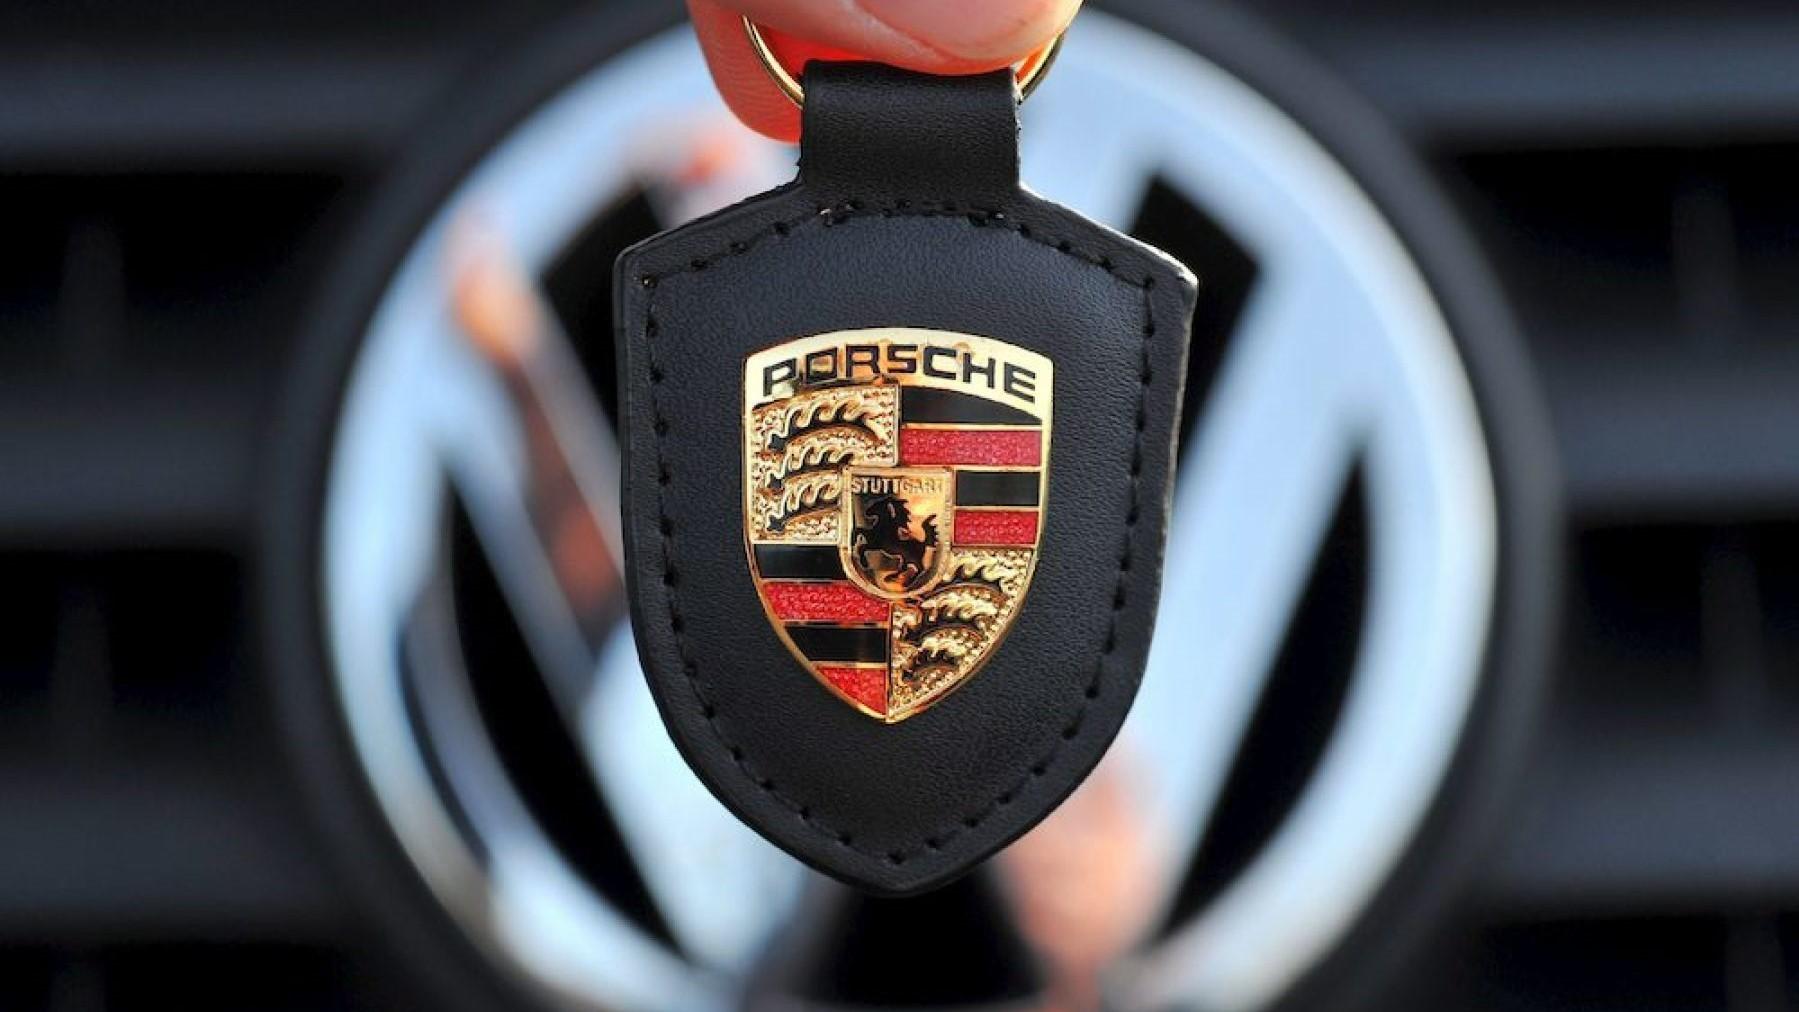 Así se plantea el futuro de Porsche